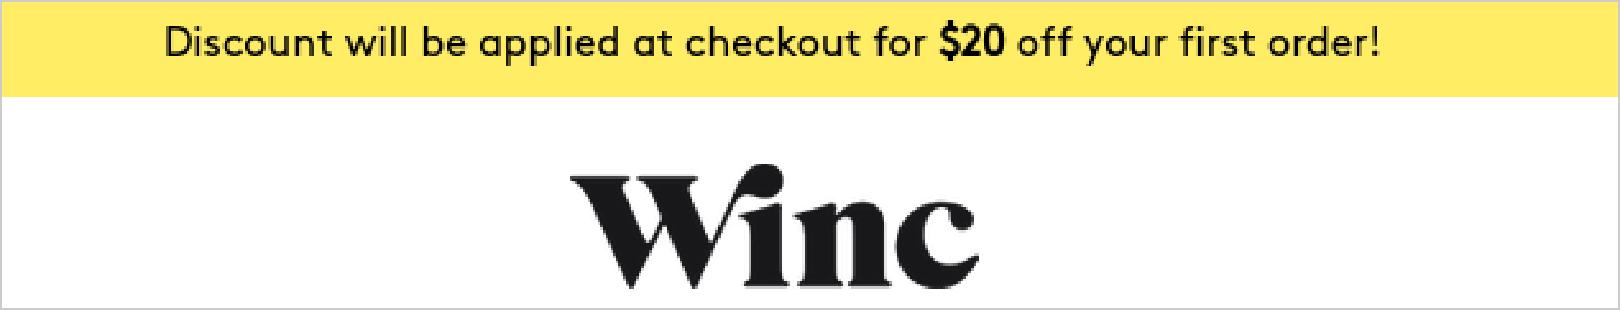 Winc Promotion